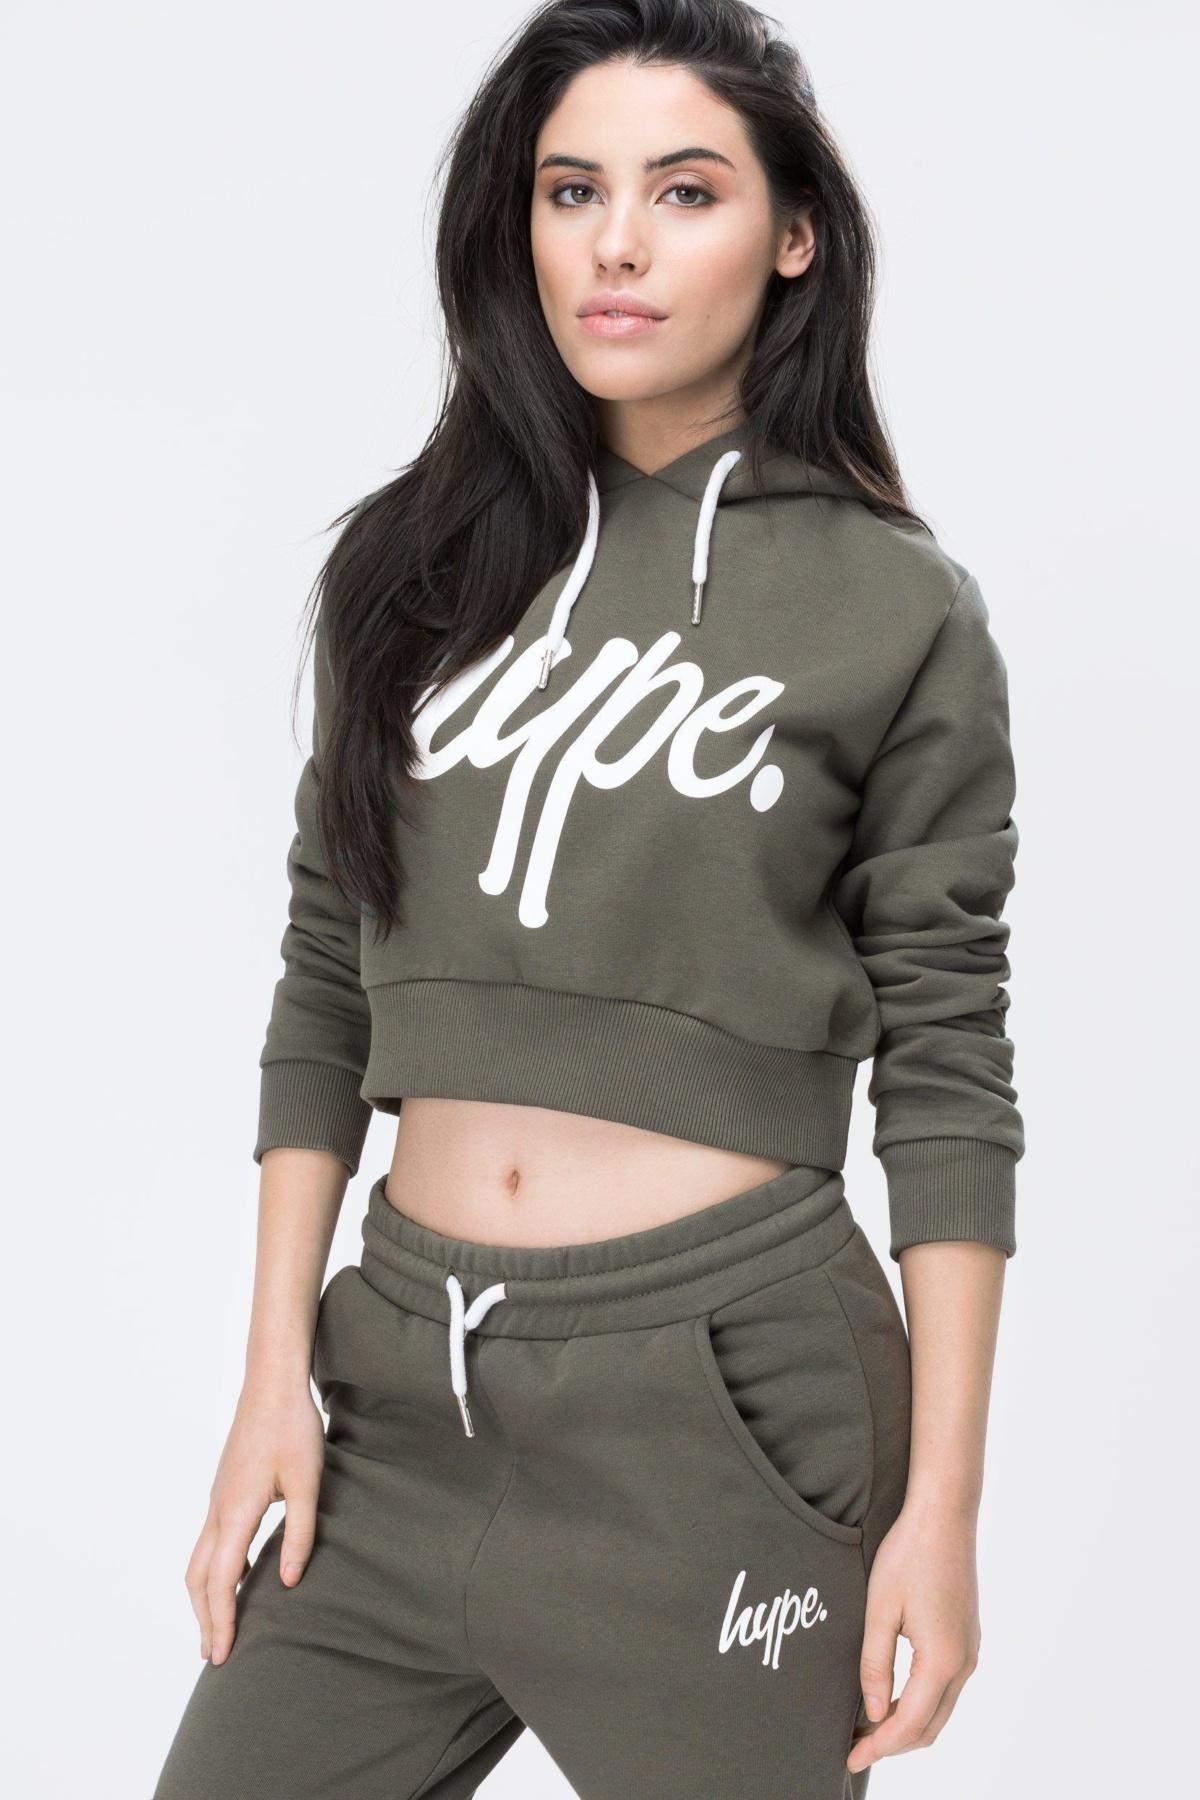 HYPE Khaki/White Hype Script Women's Crop Hoodie